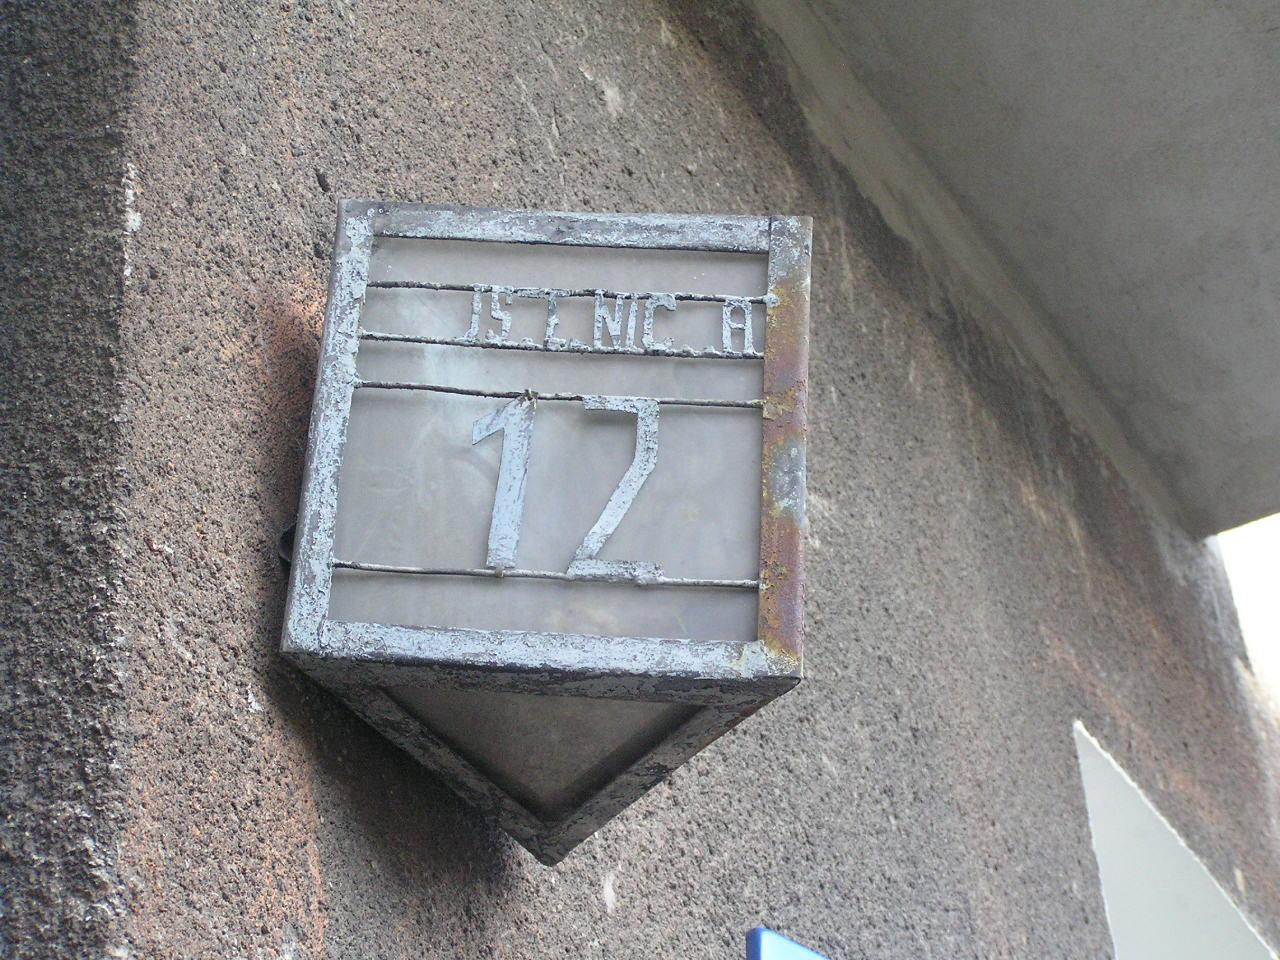 Latarenka adresowa - Pustelnicka 12